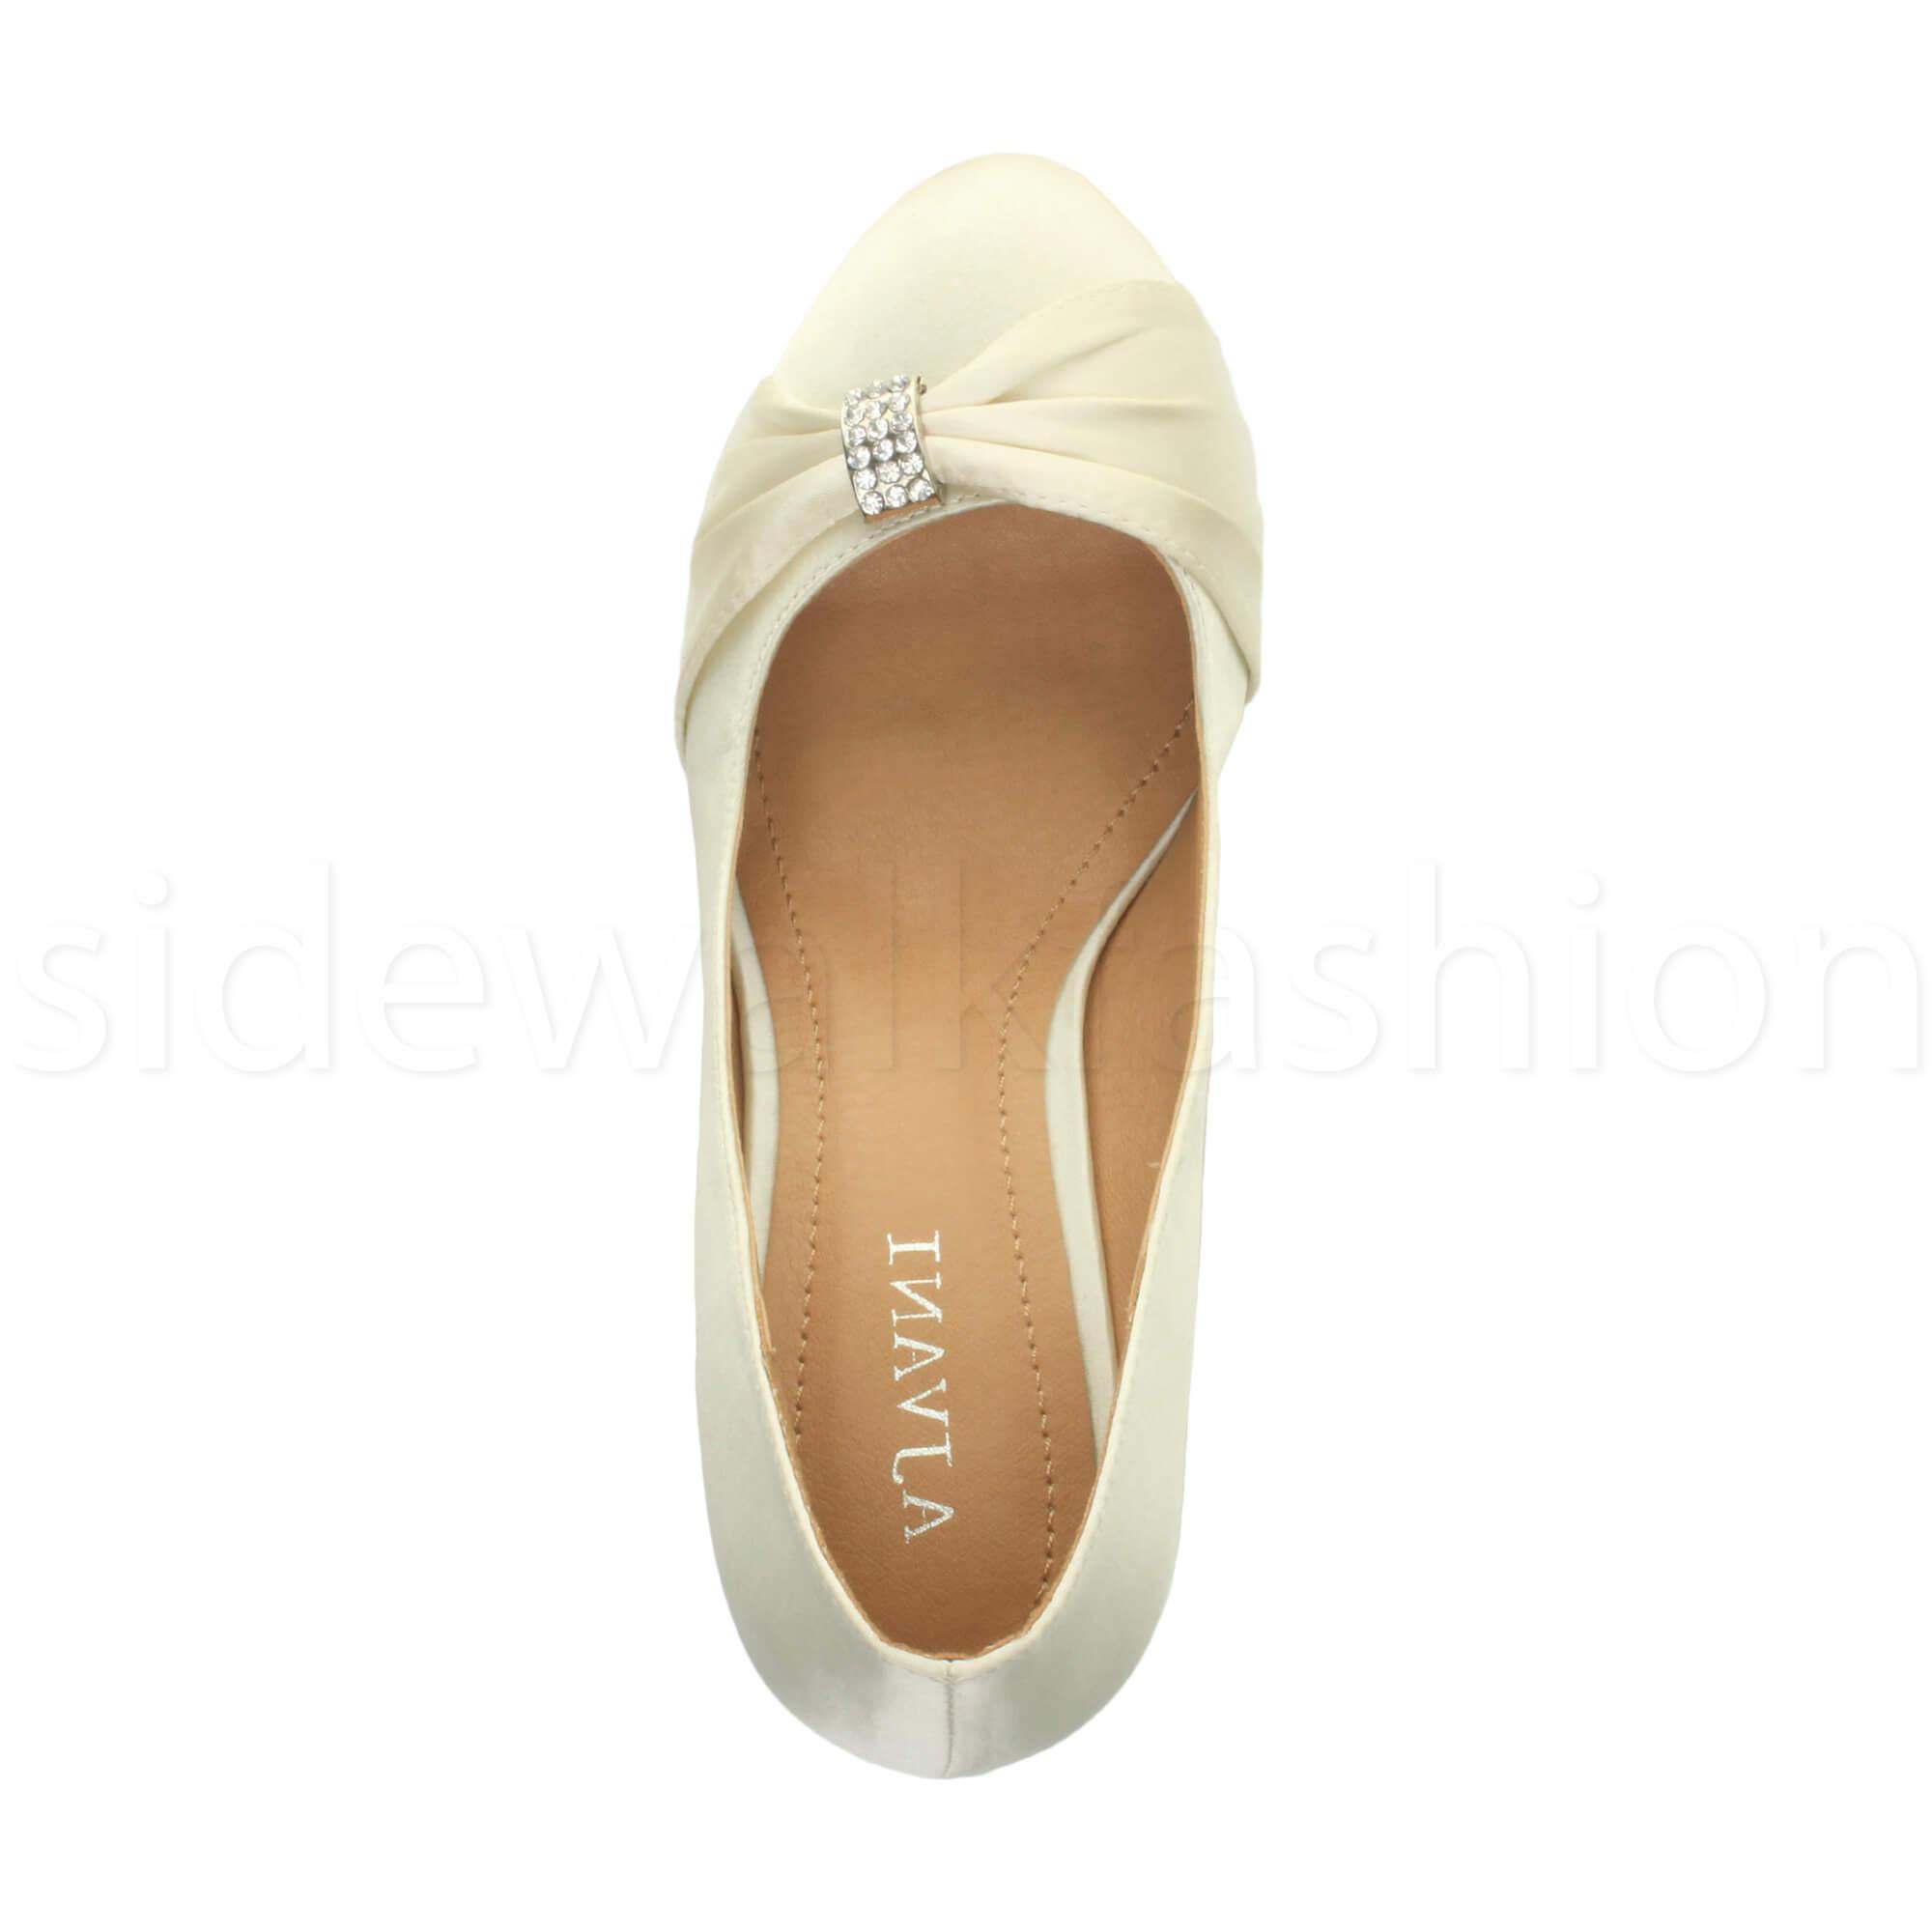 Womens-ladies-low-mid-heel-diamante-party-smart-evening-court-shoes-size thumbnail 40